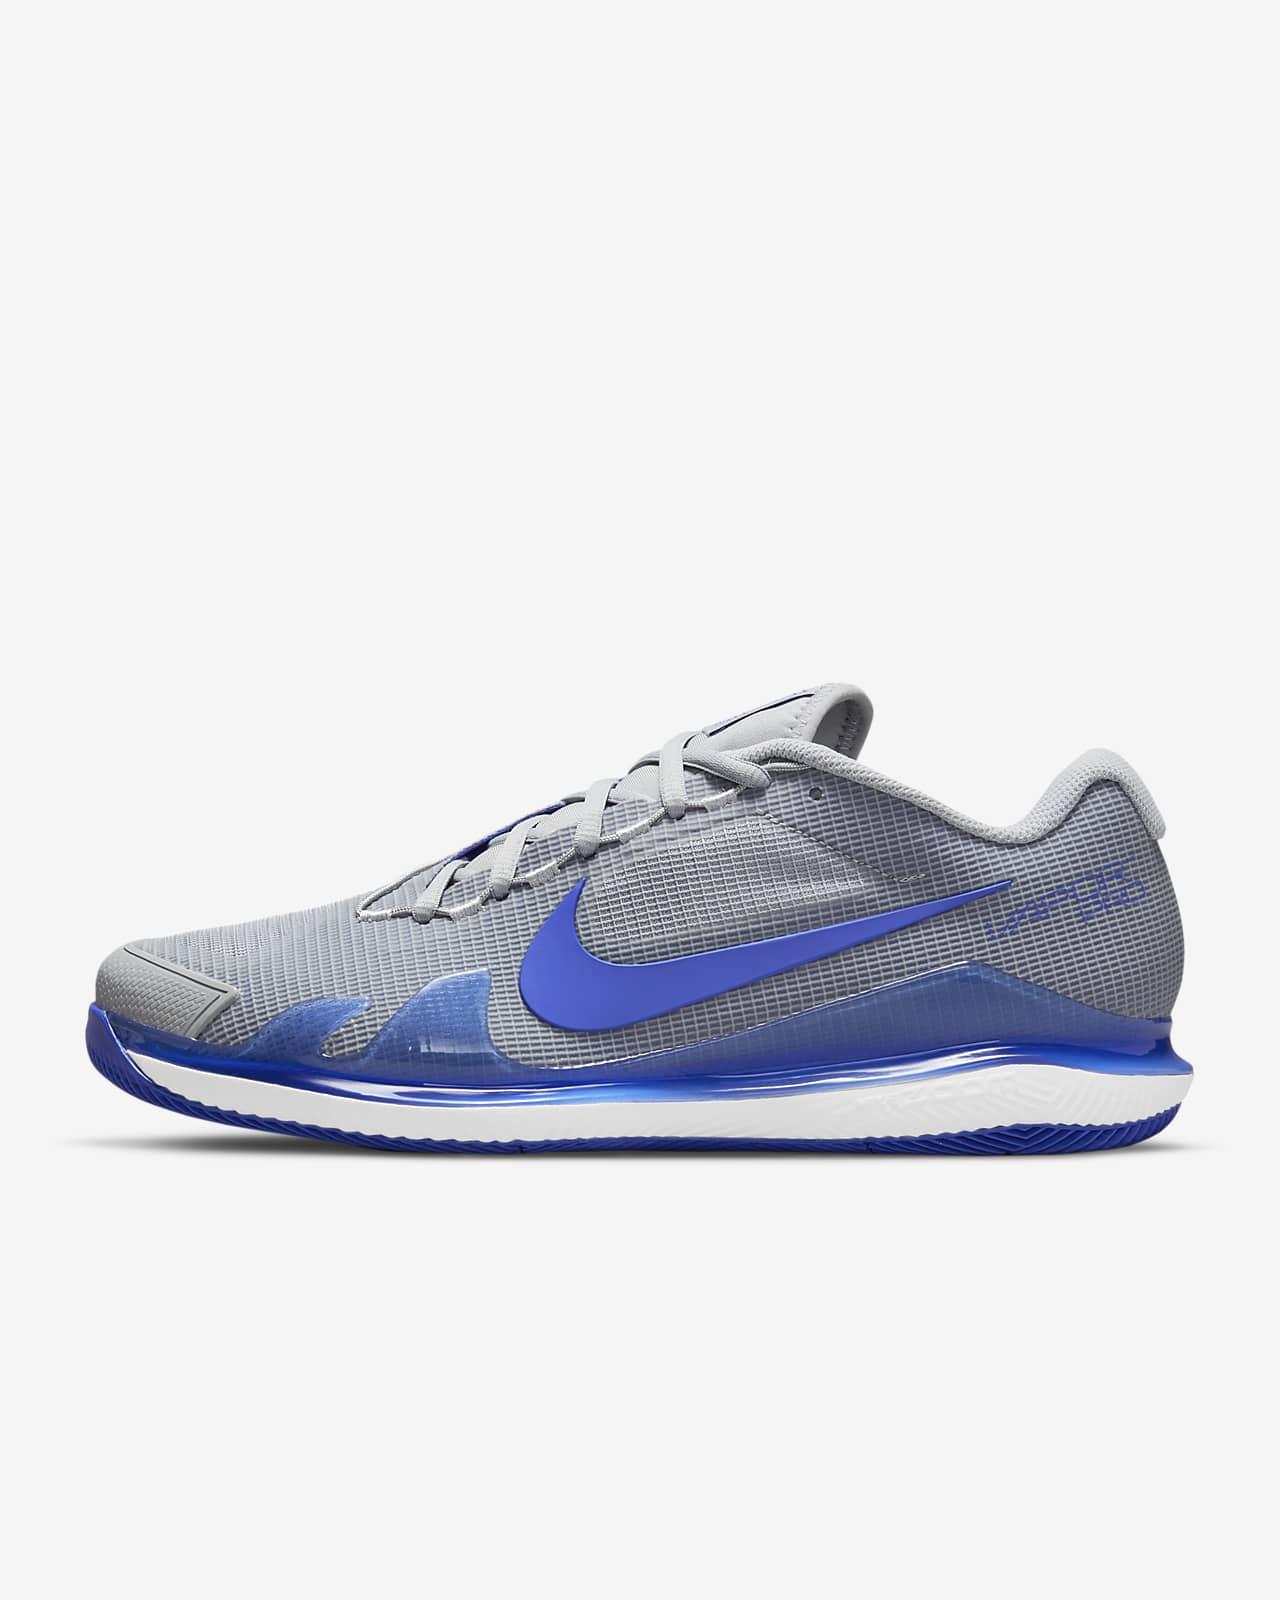 NikeCourt Air Zoom Vapor Pro 男款硬地球場網球鞋